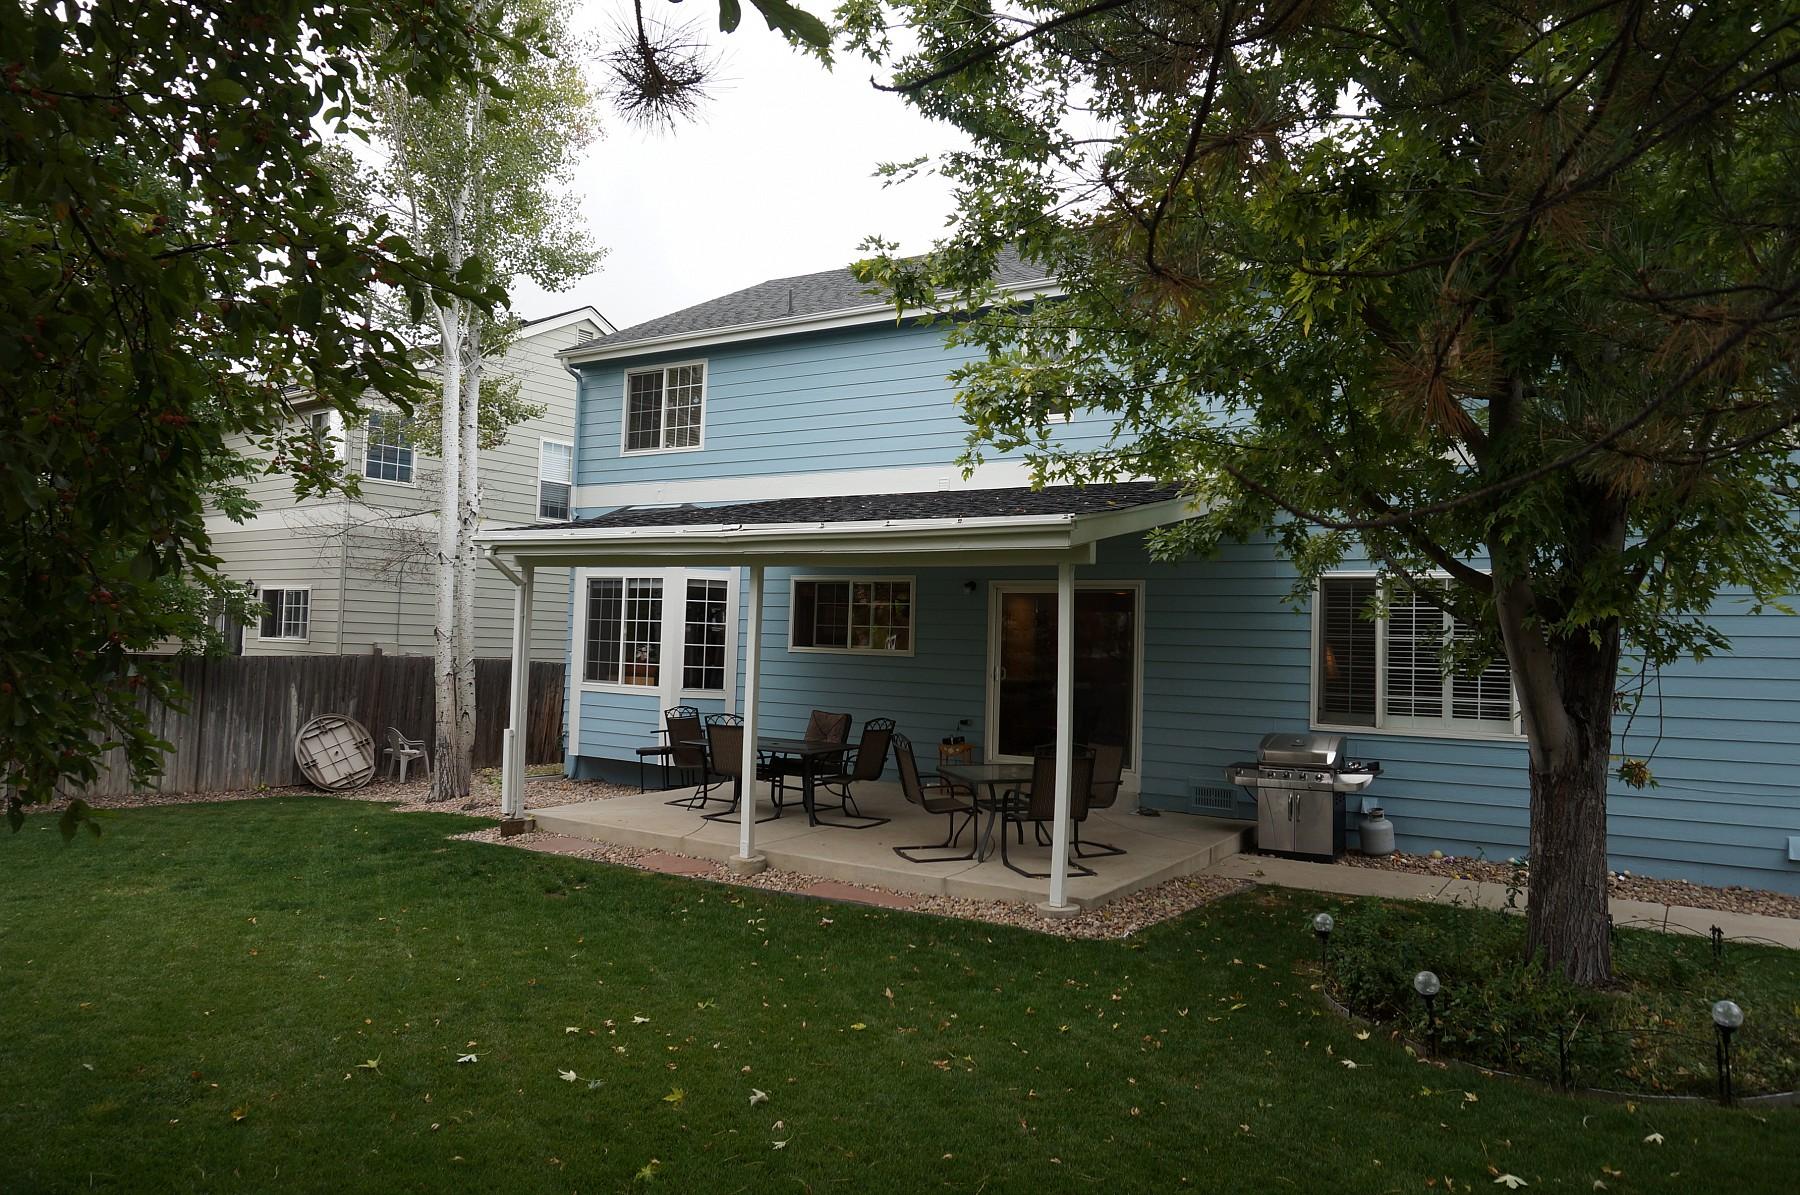 6265 West Berry Avenue, Littleton, CO 80123